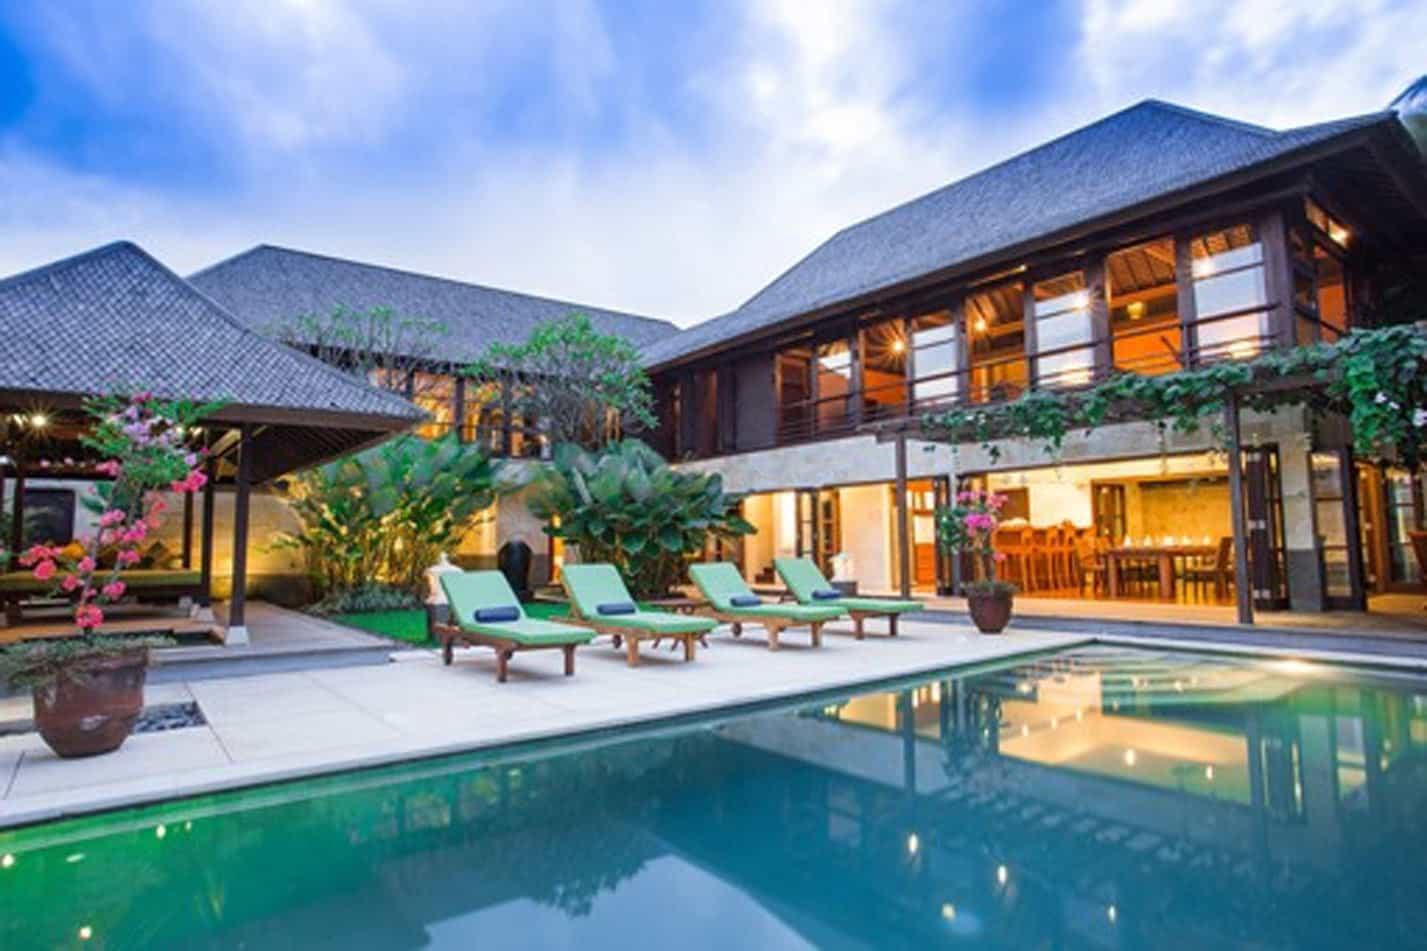 Luxury Villas pool and sunbed view